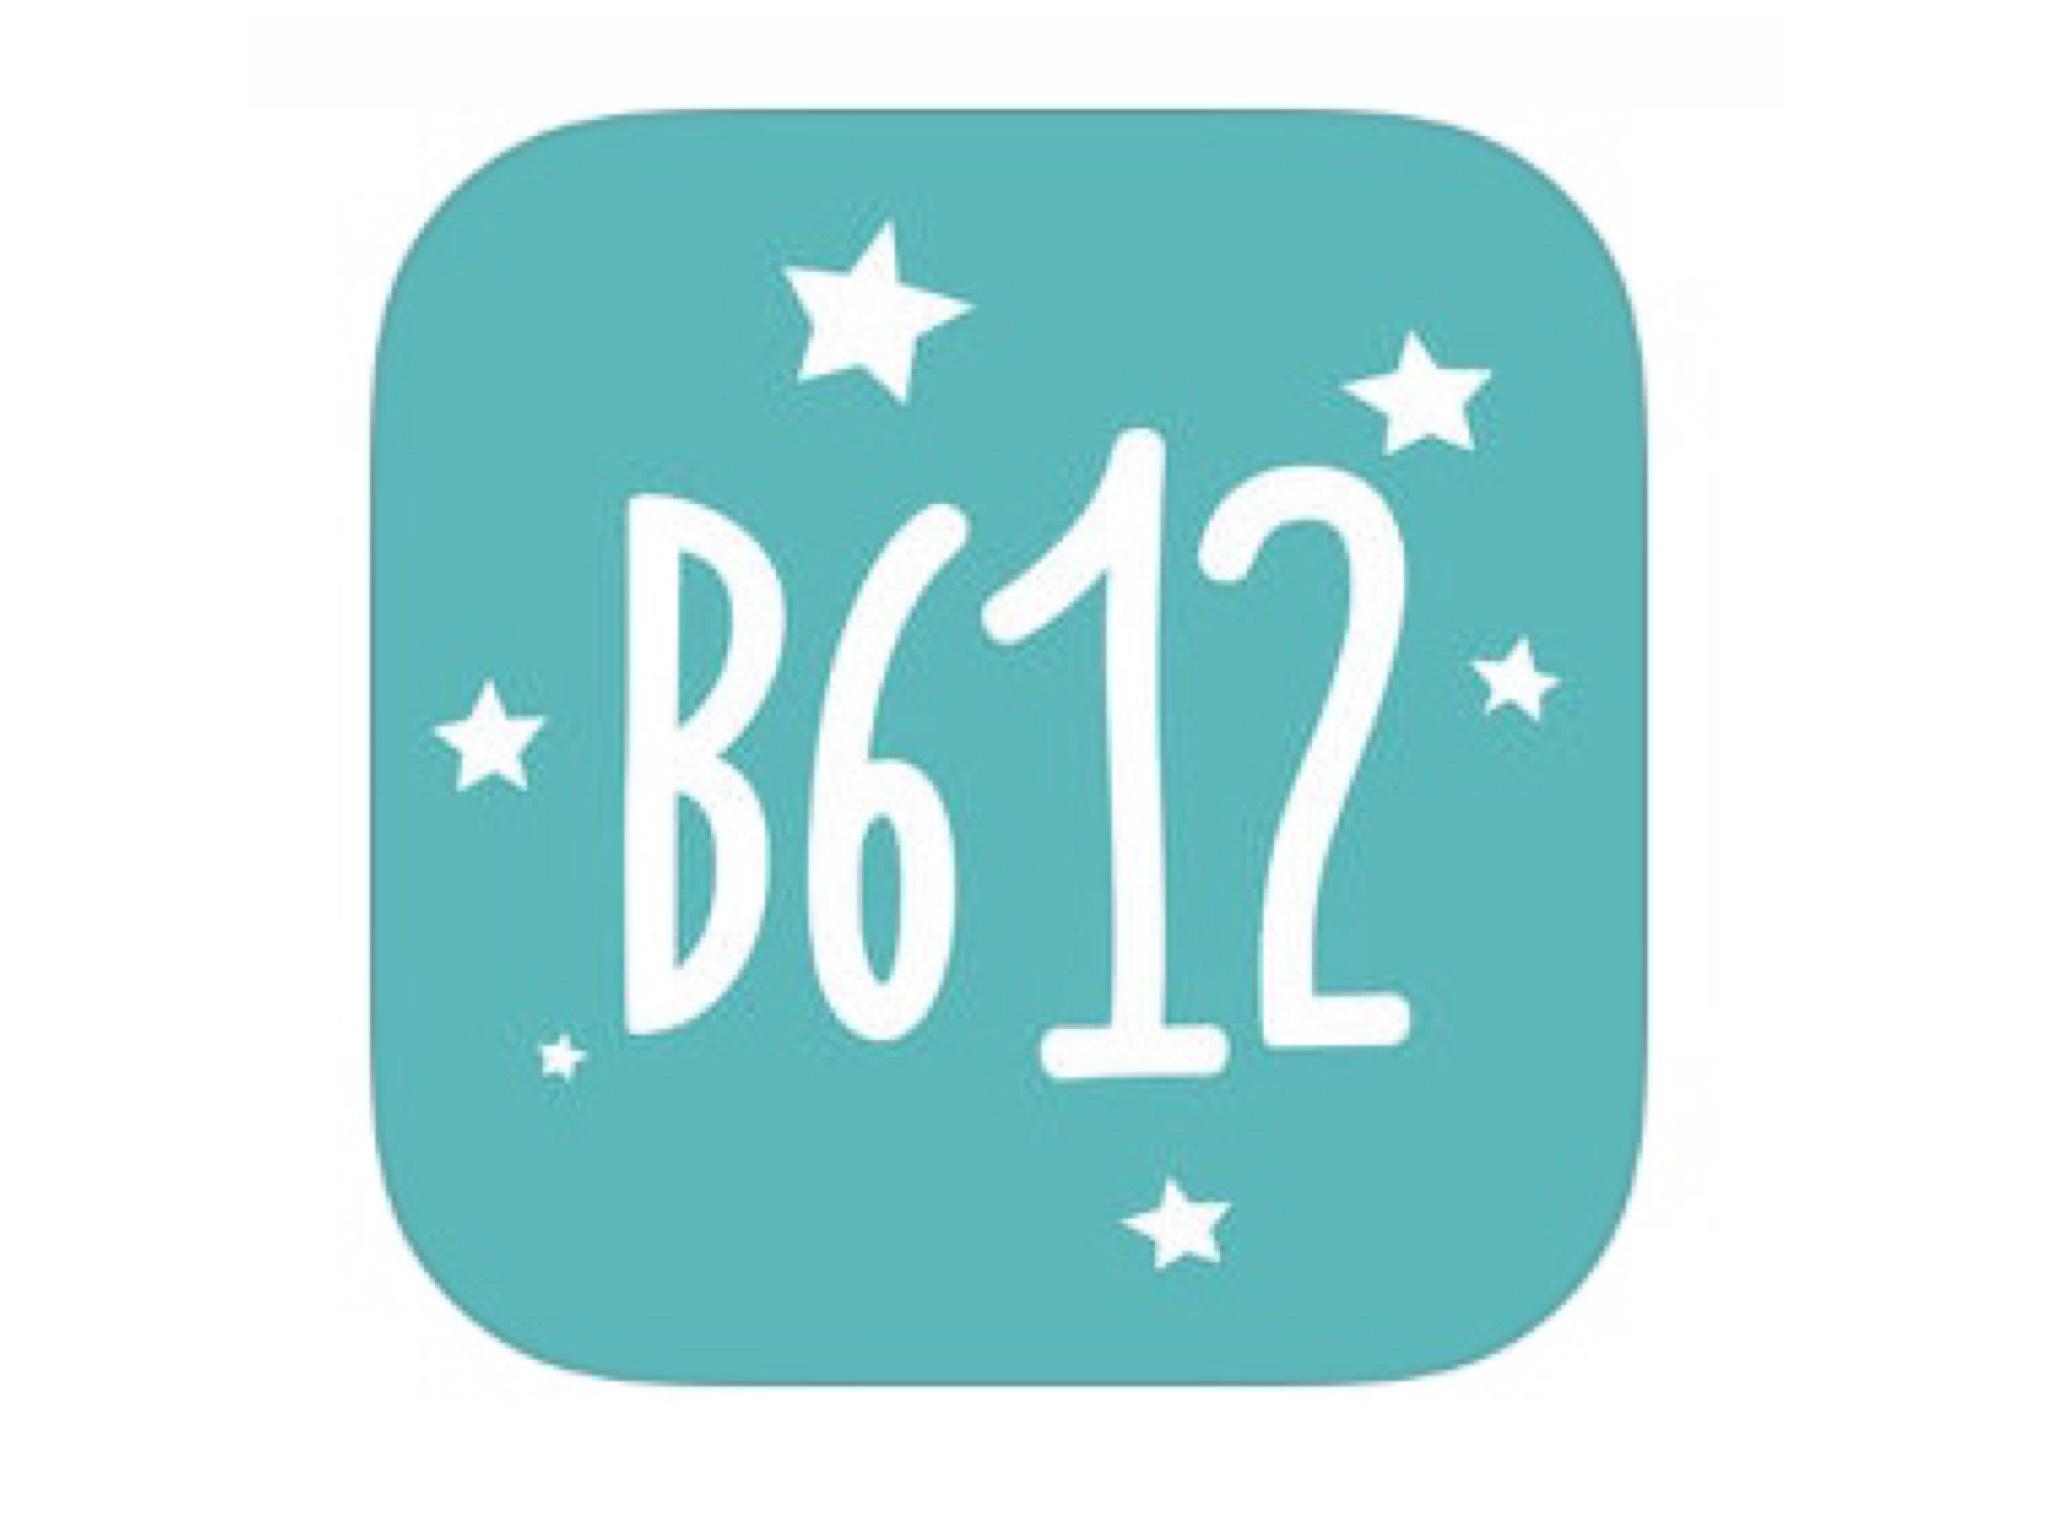 B612のアイコン画像